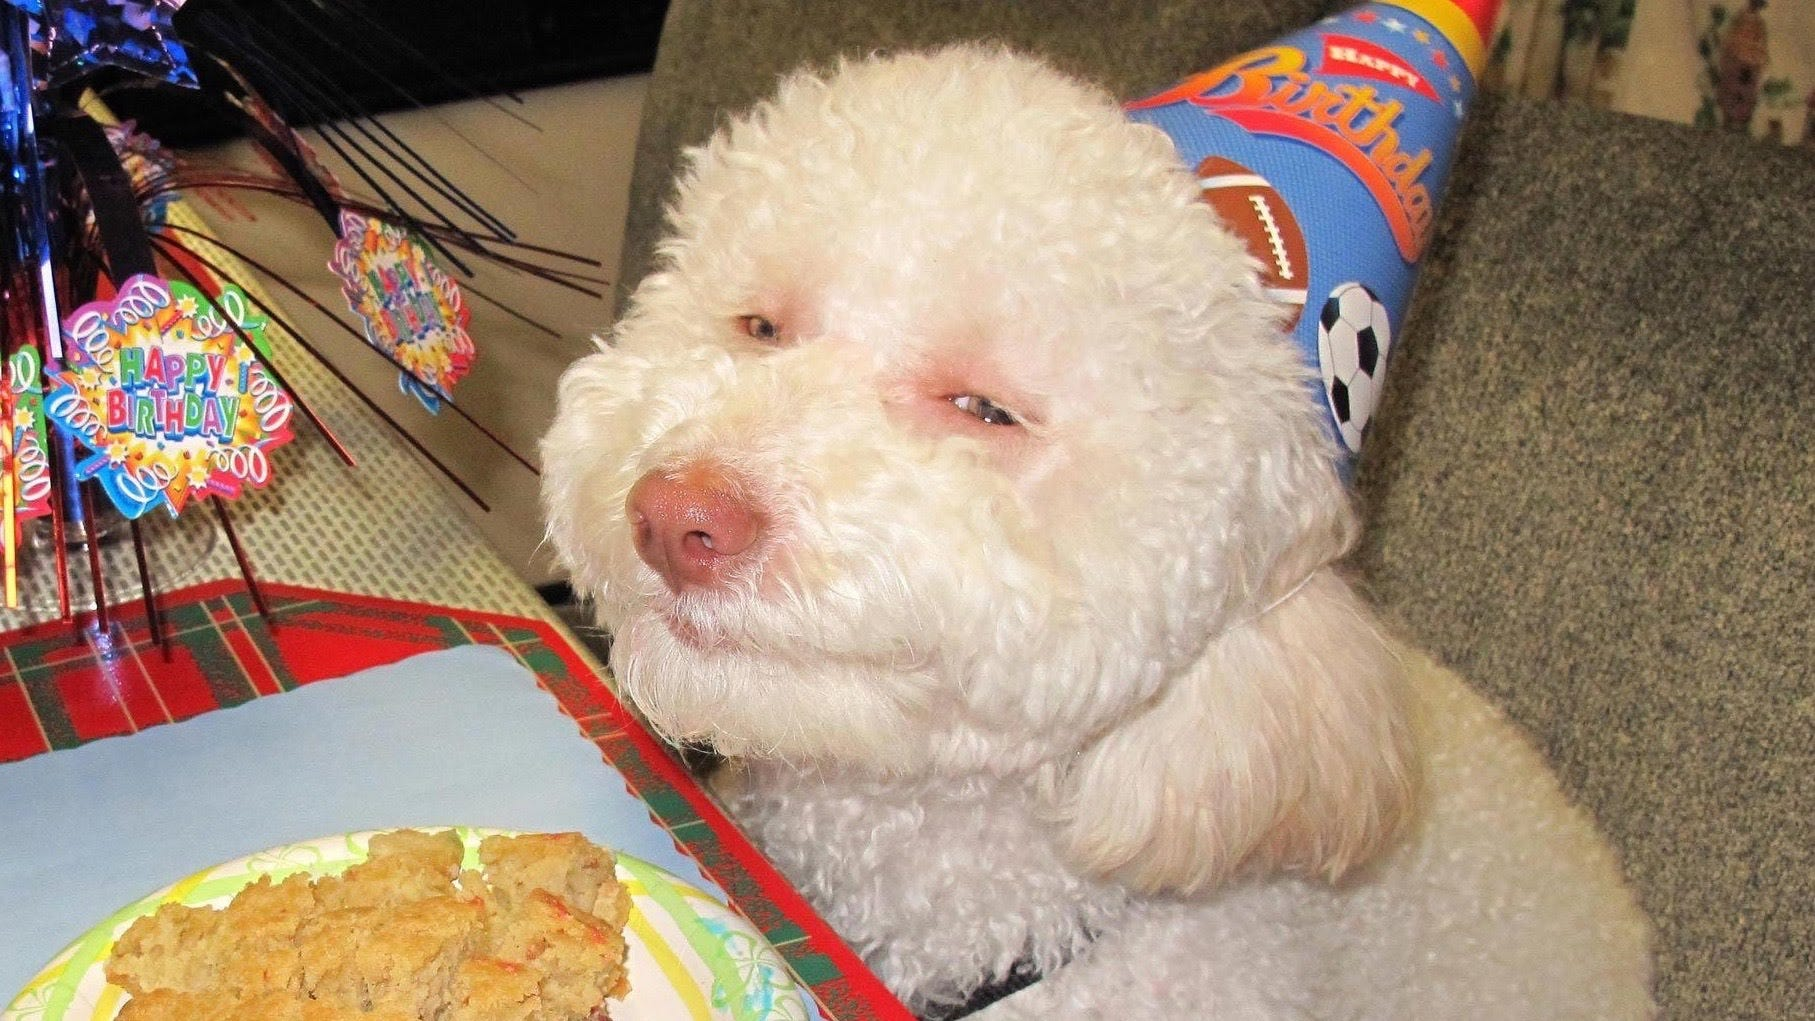 Stoned birthday dog - photo#5